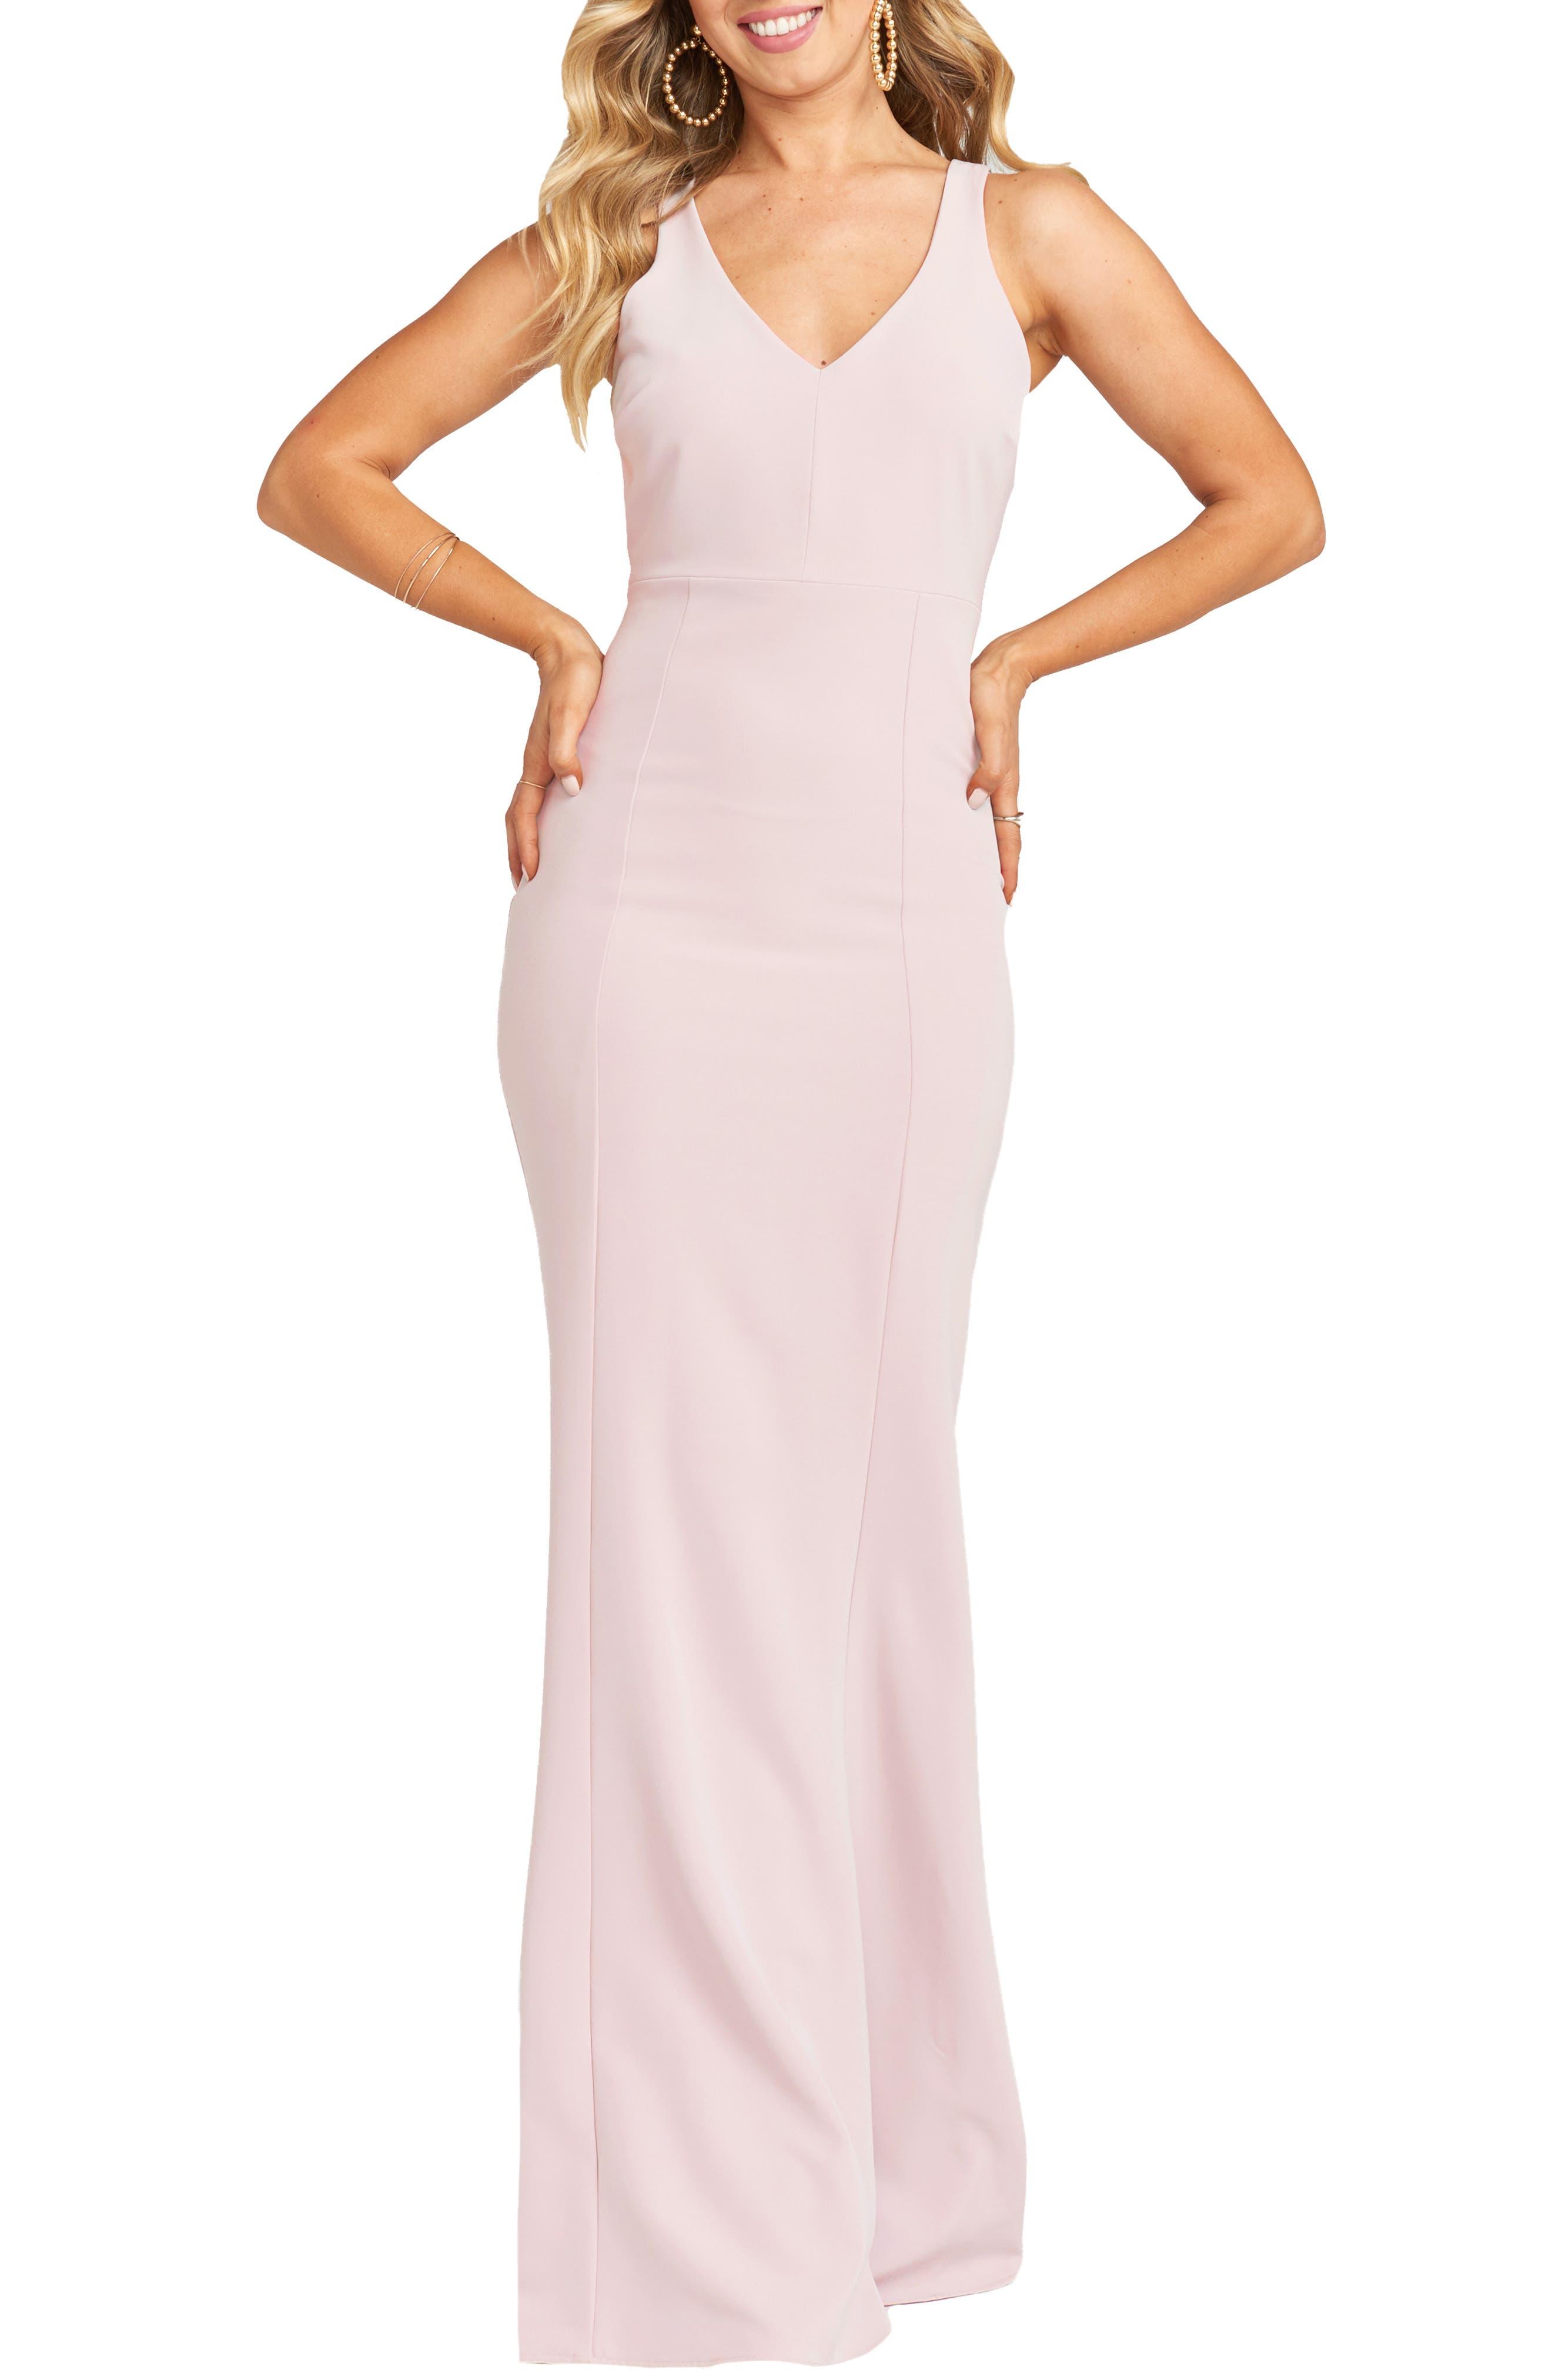 Show Me Your Mumu Milan Mermaid Evening Gown, Pink